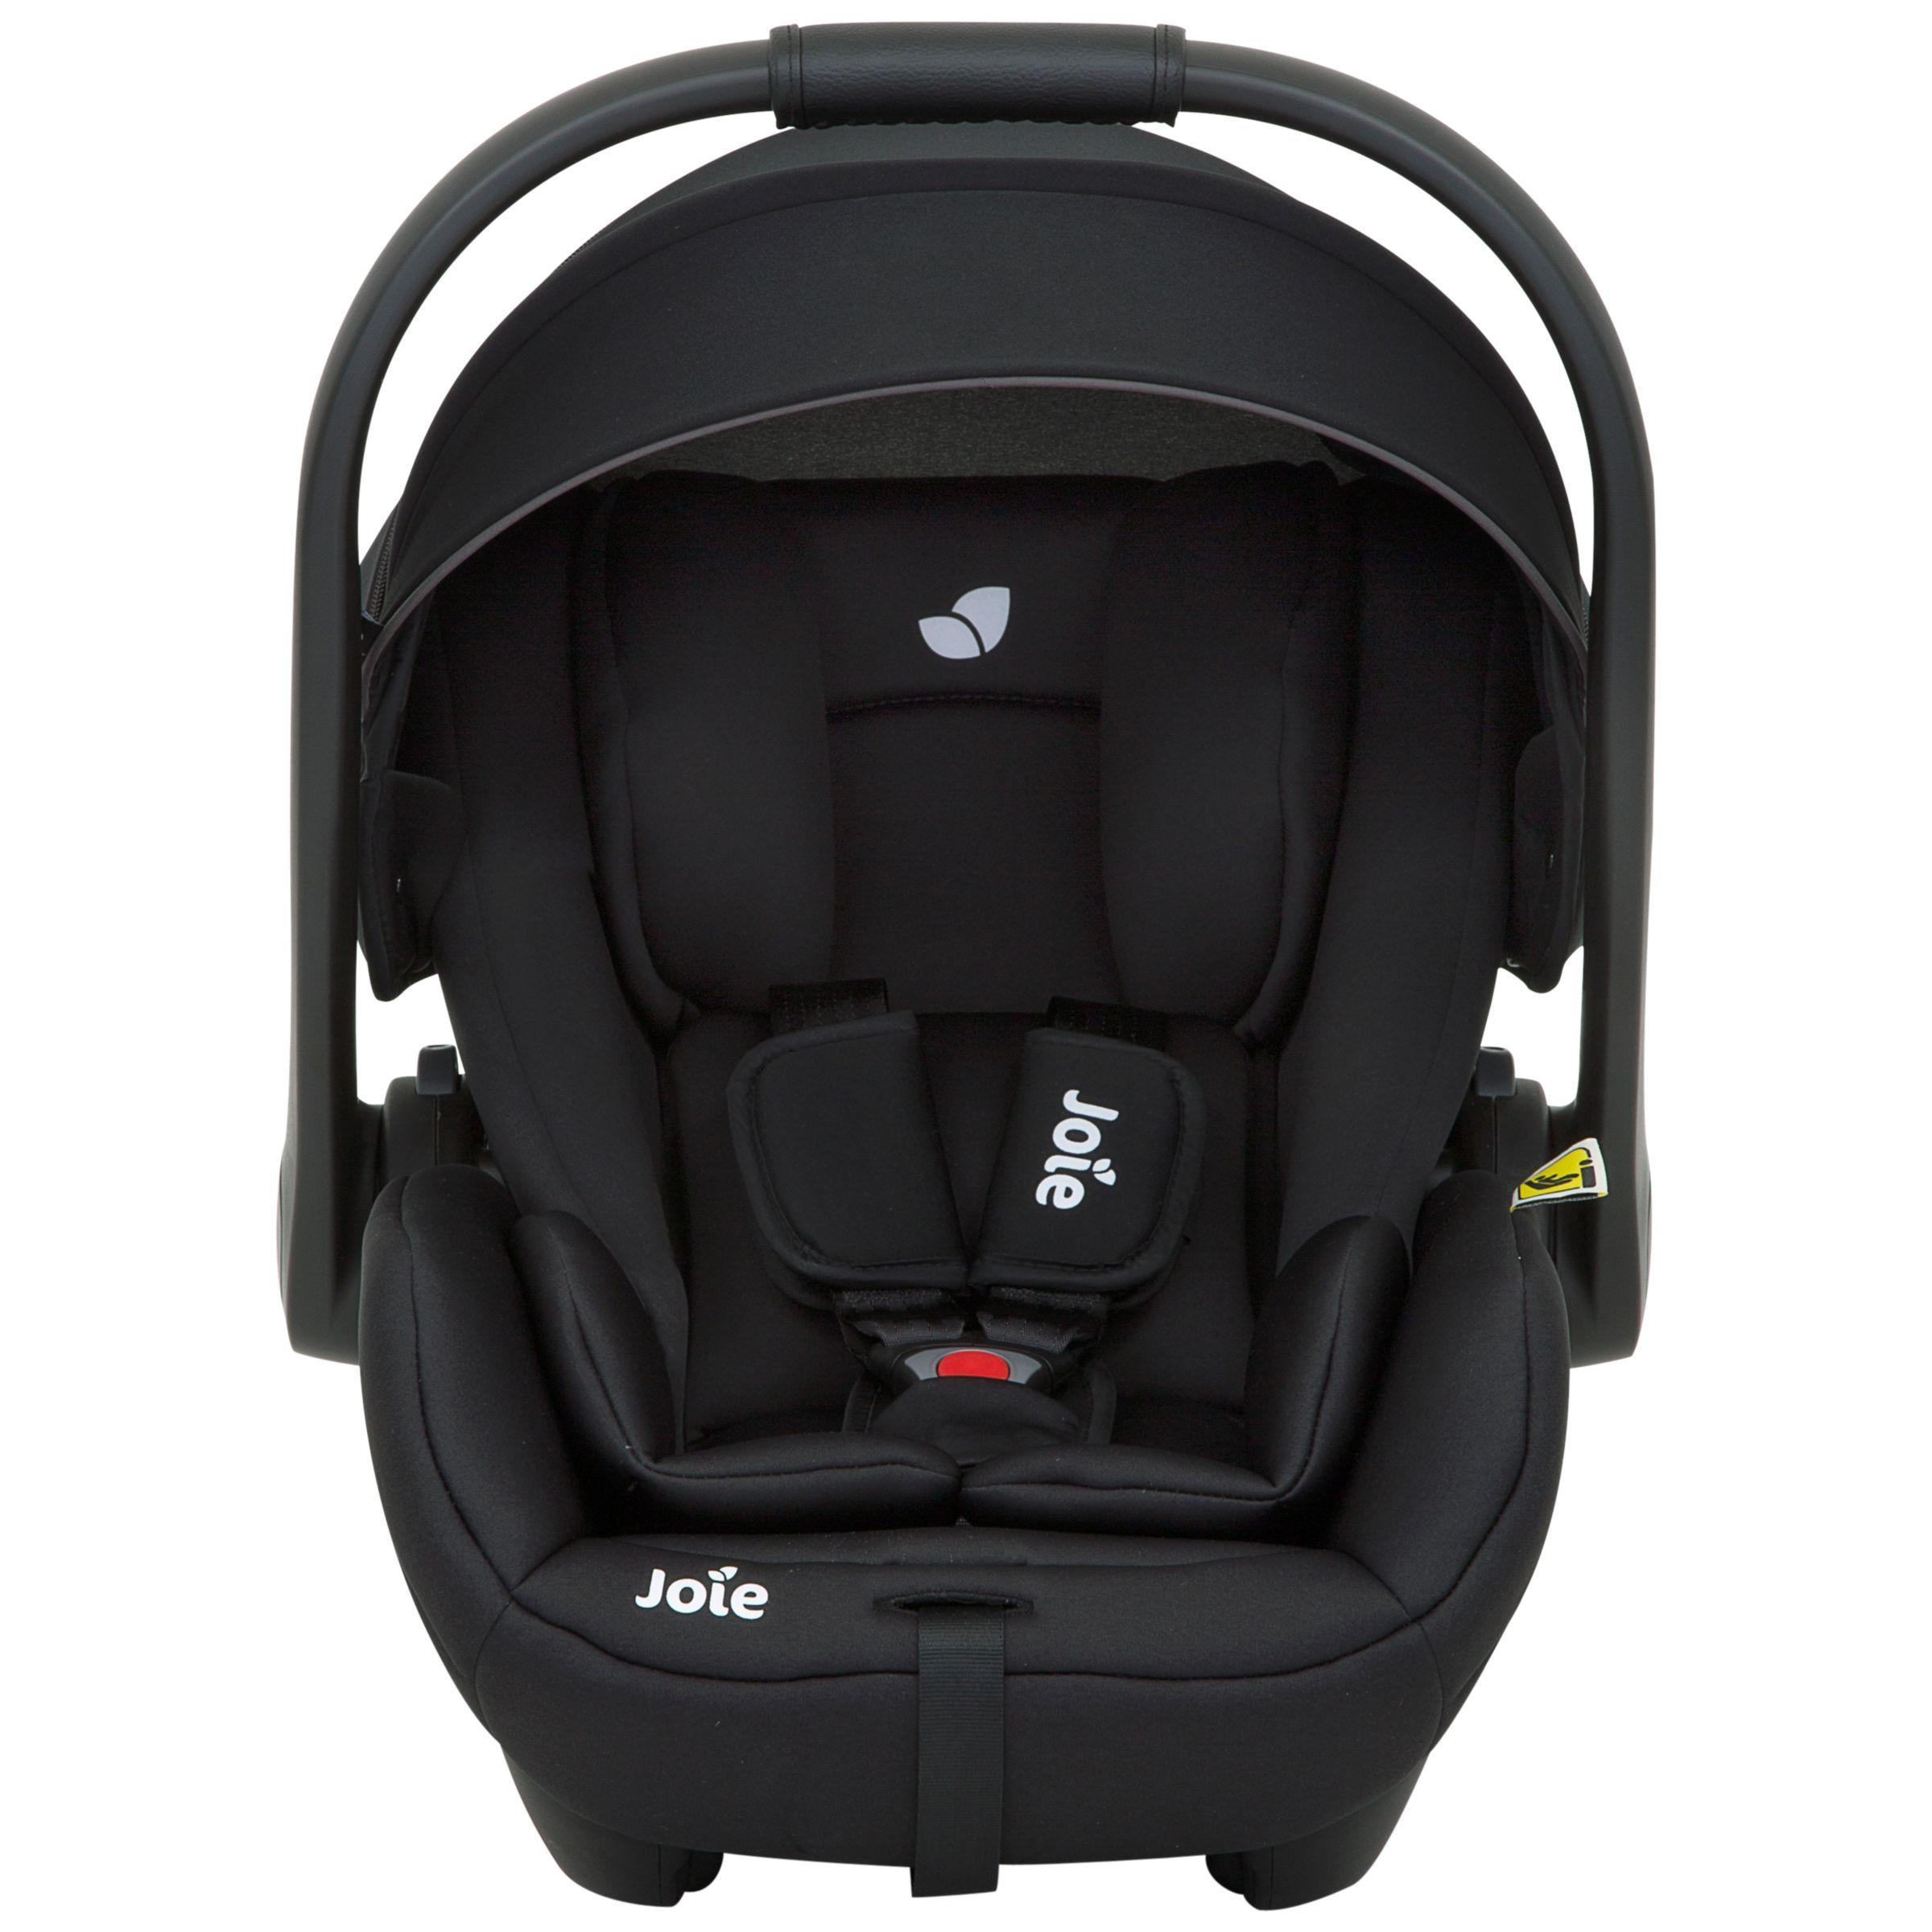 Joie Baby iLevel Group 0+ Baby Car Seat, Coal Baby car